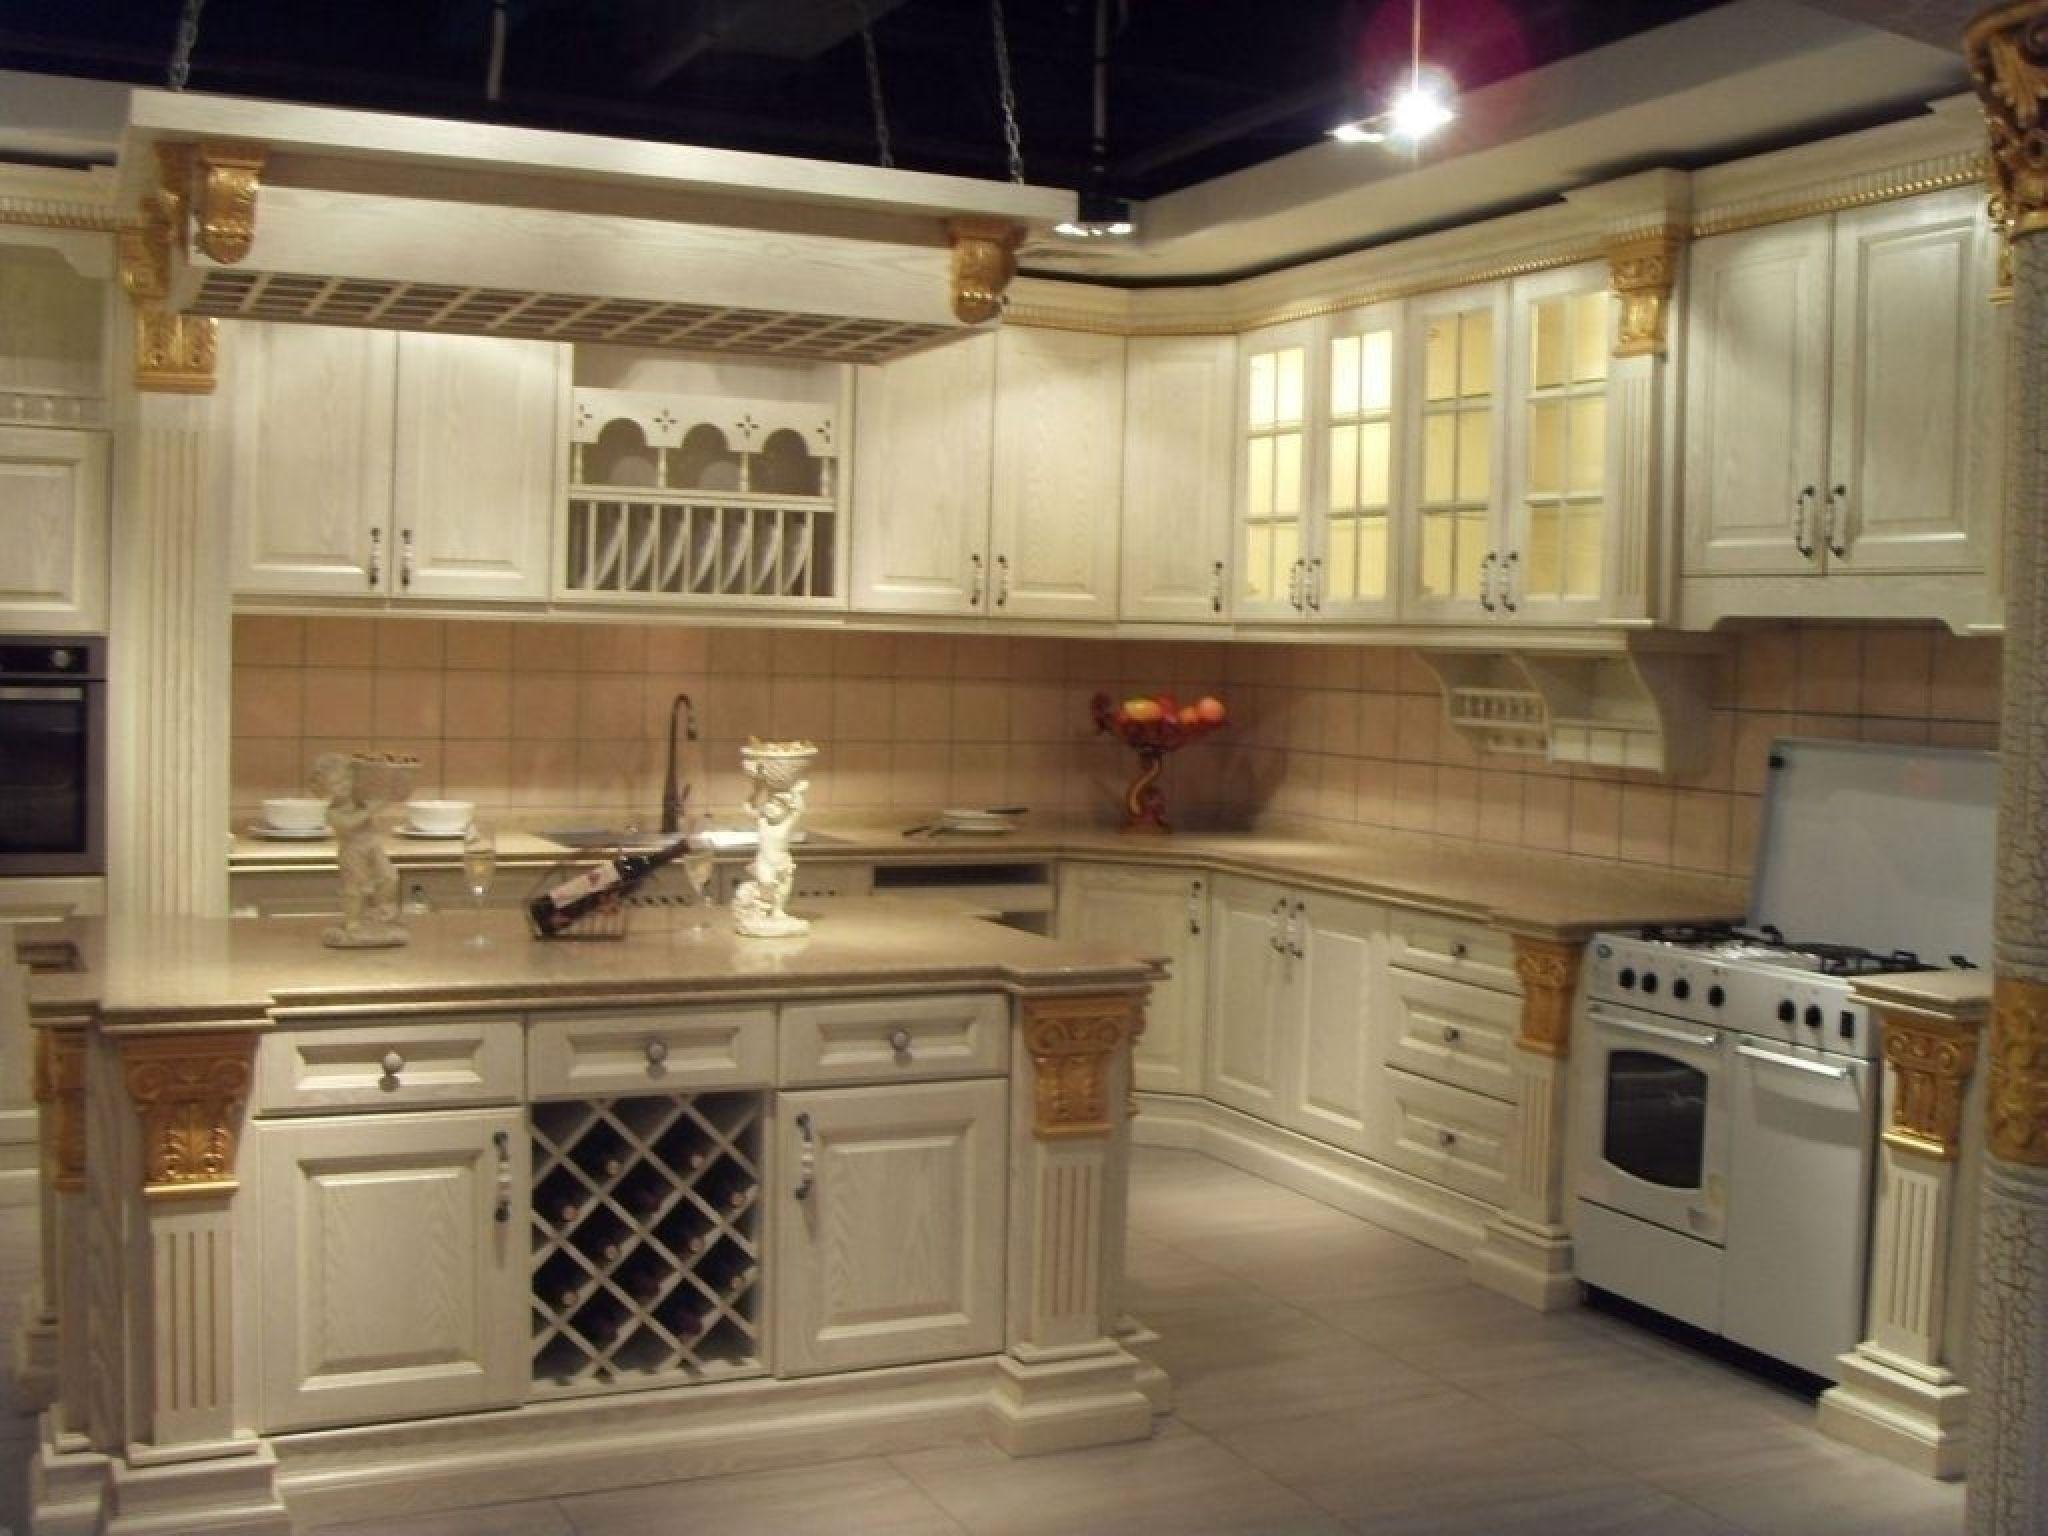 Best Kitchen Gallery: Italian Kitchen Cabi S Manufacturers Decorative Kitchen of Kitchen Cabinet Manufacturers on cal-ite.com